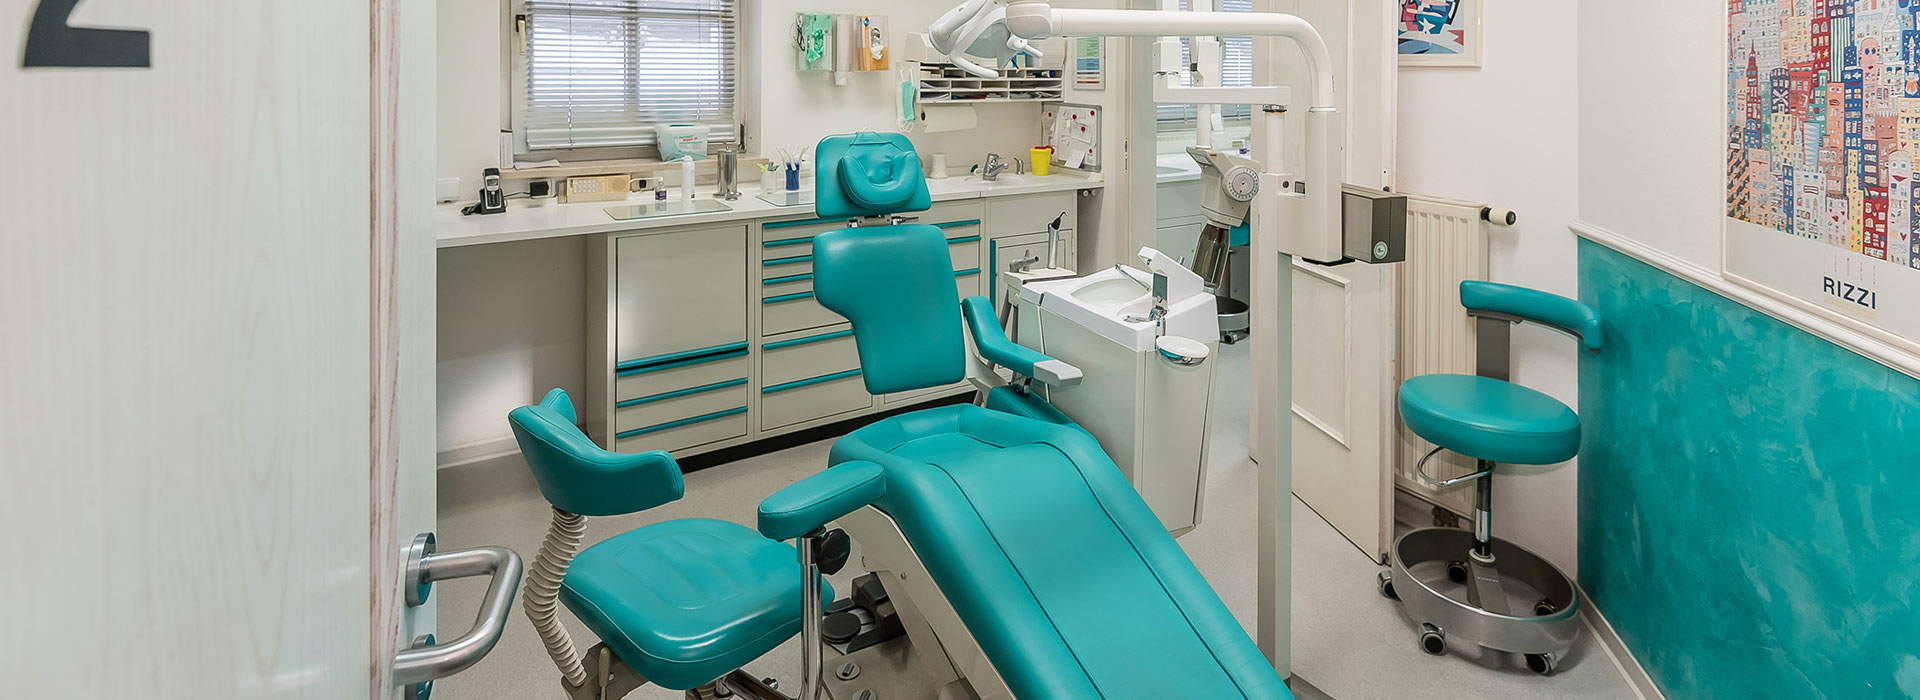 Behandlungszimmer 2 in der Zahnarztpraxis Münsing